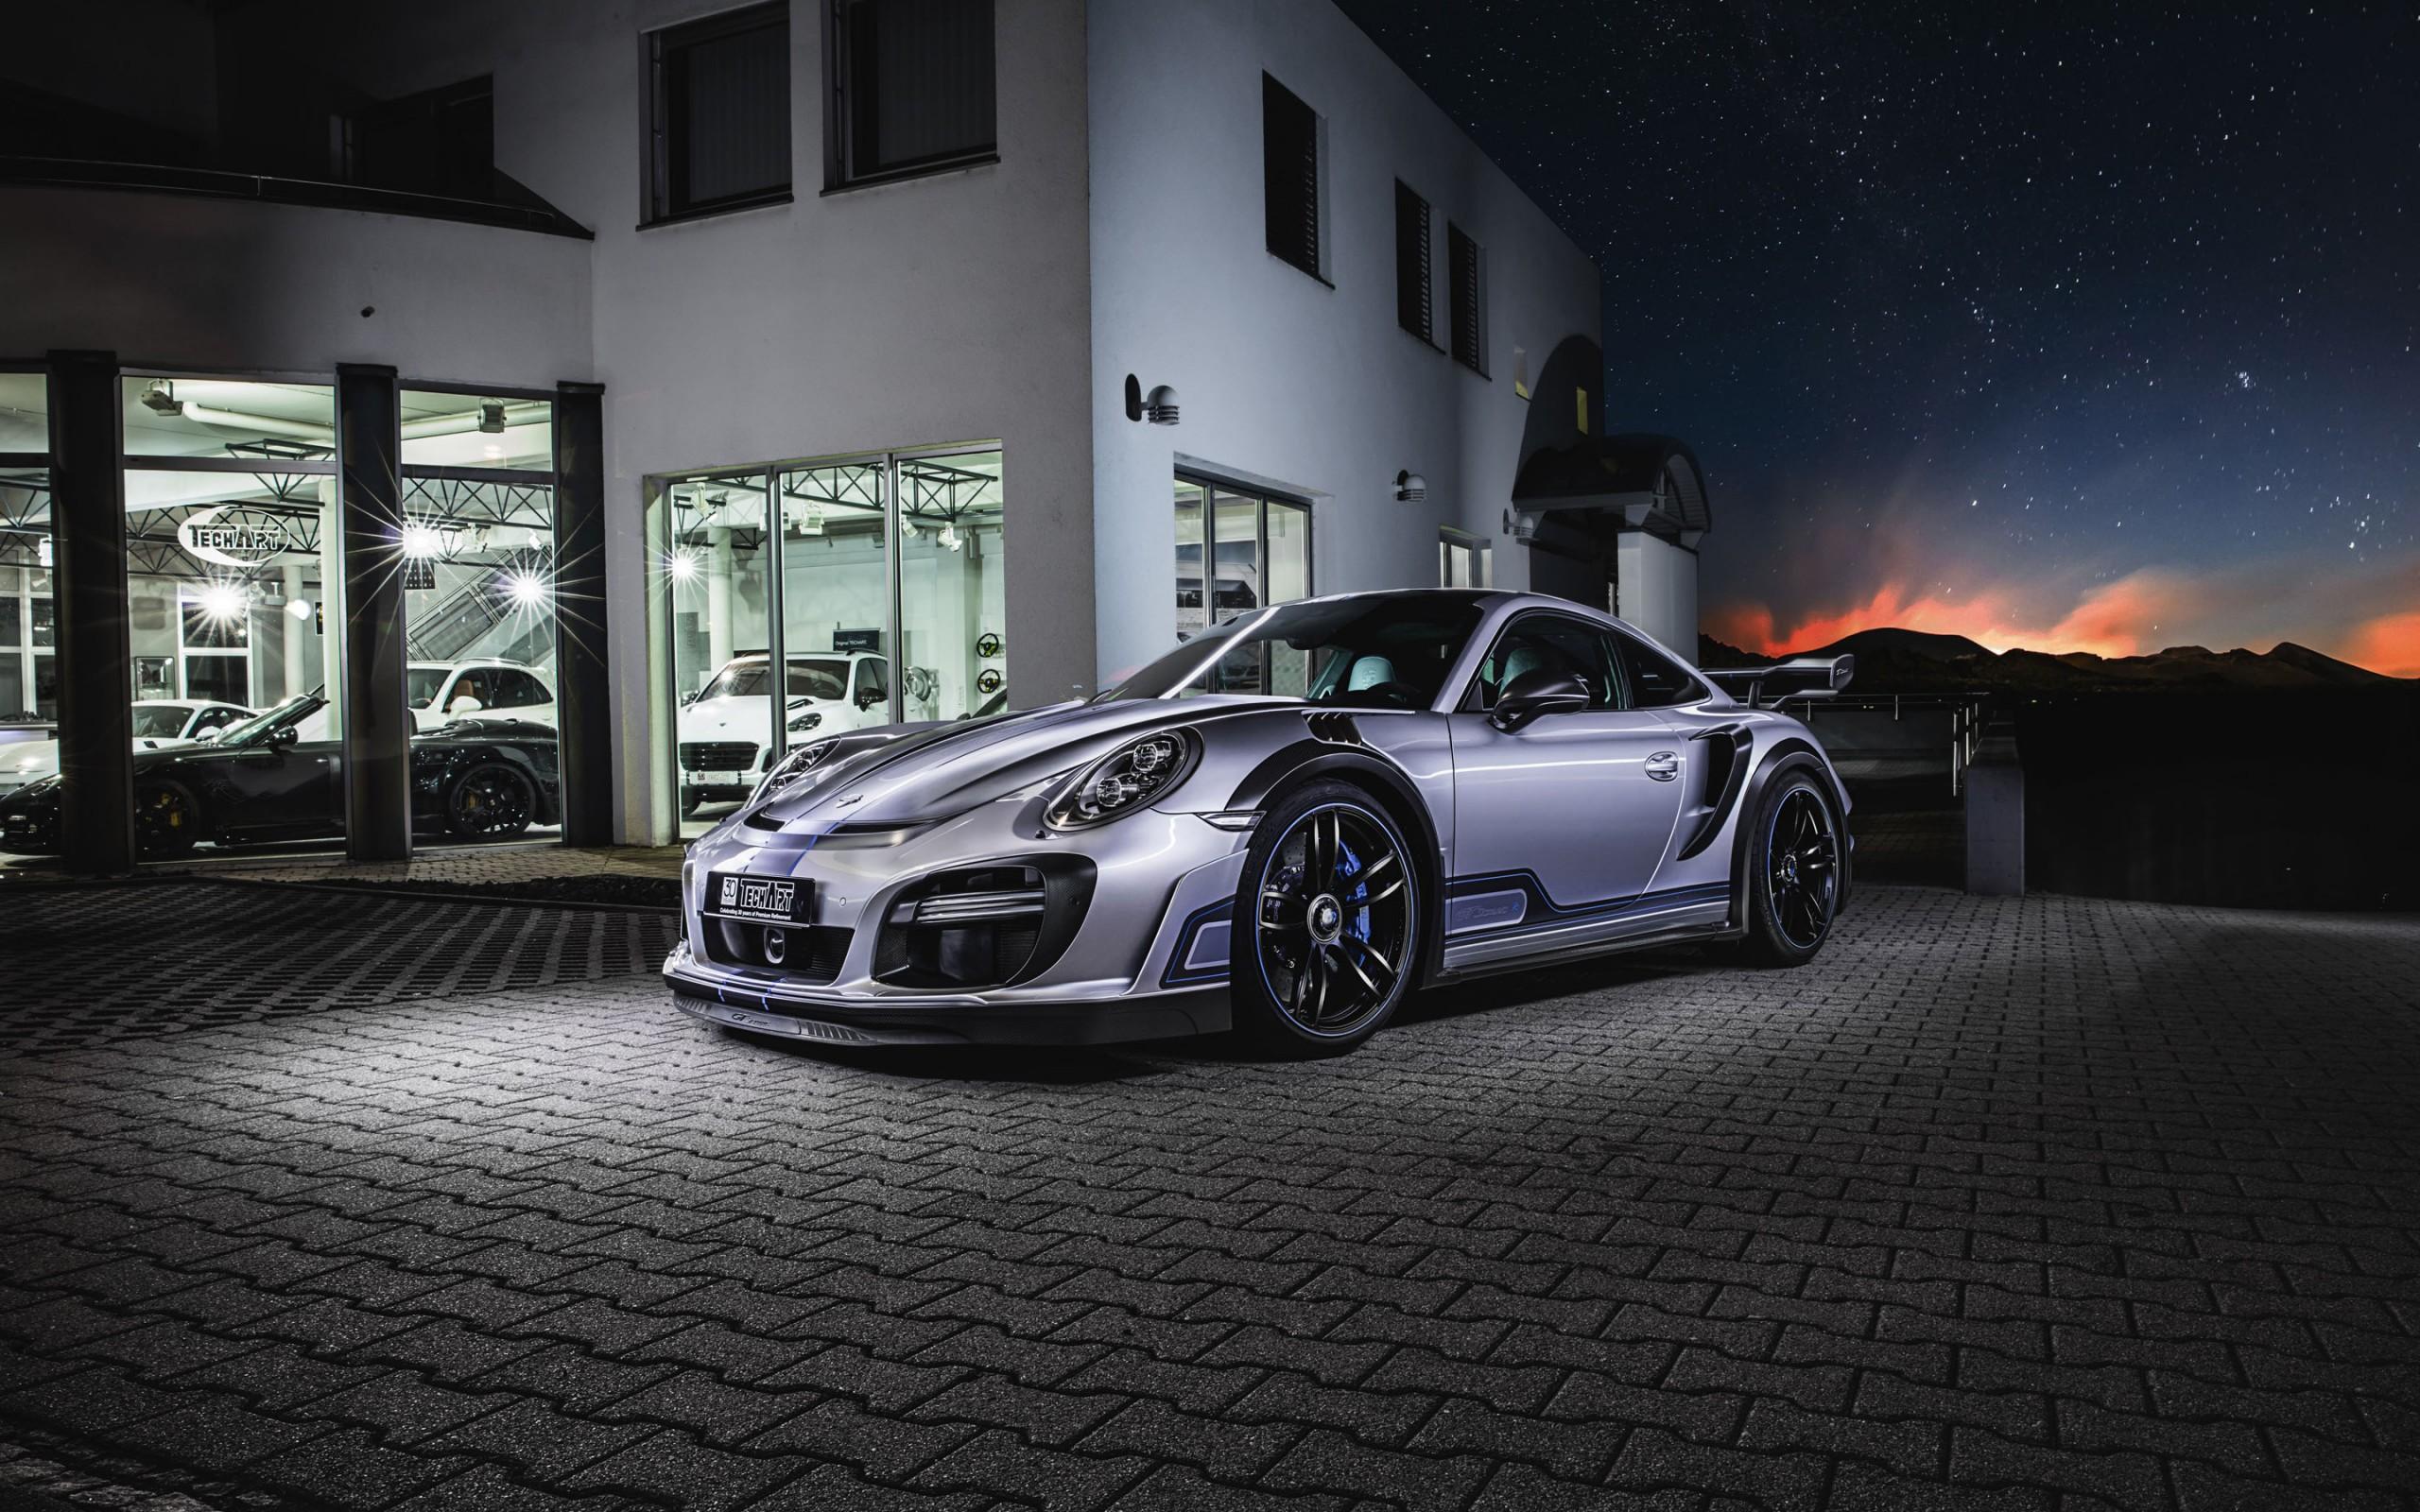 Latest 3d Hd Wallpapers For Pc 2017 Techart Porsche 911 Turbo Gt Street R Hd Wallpapers